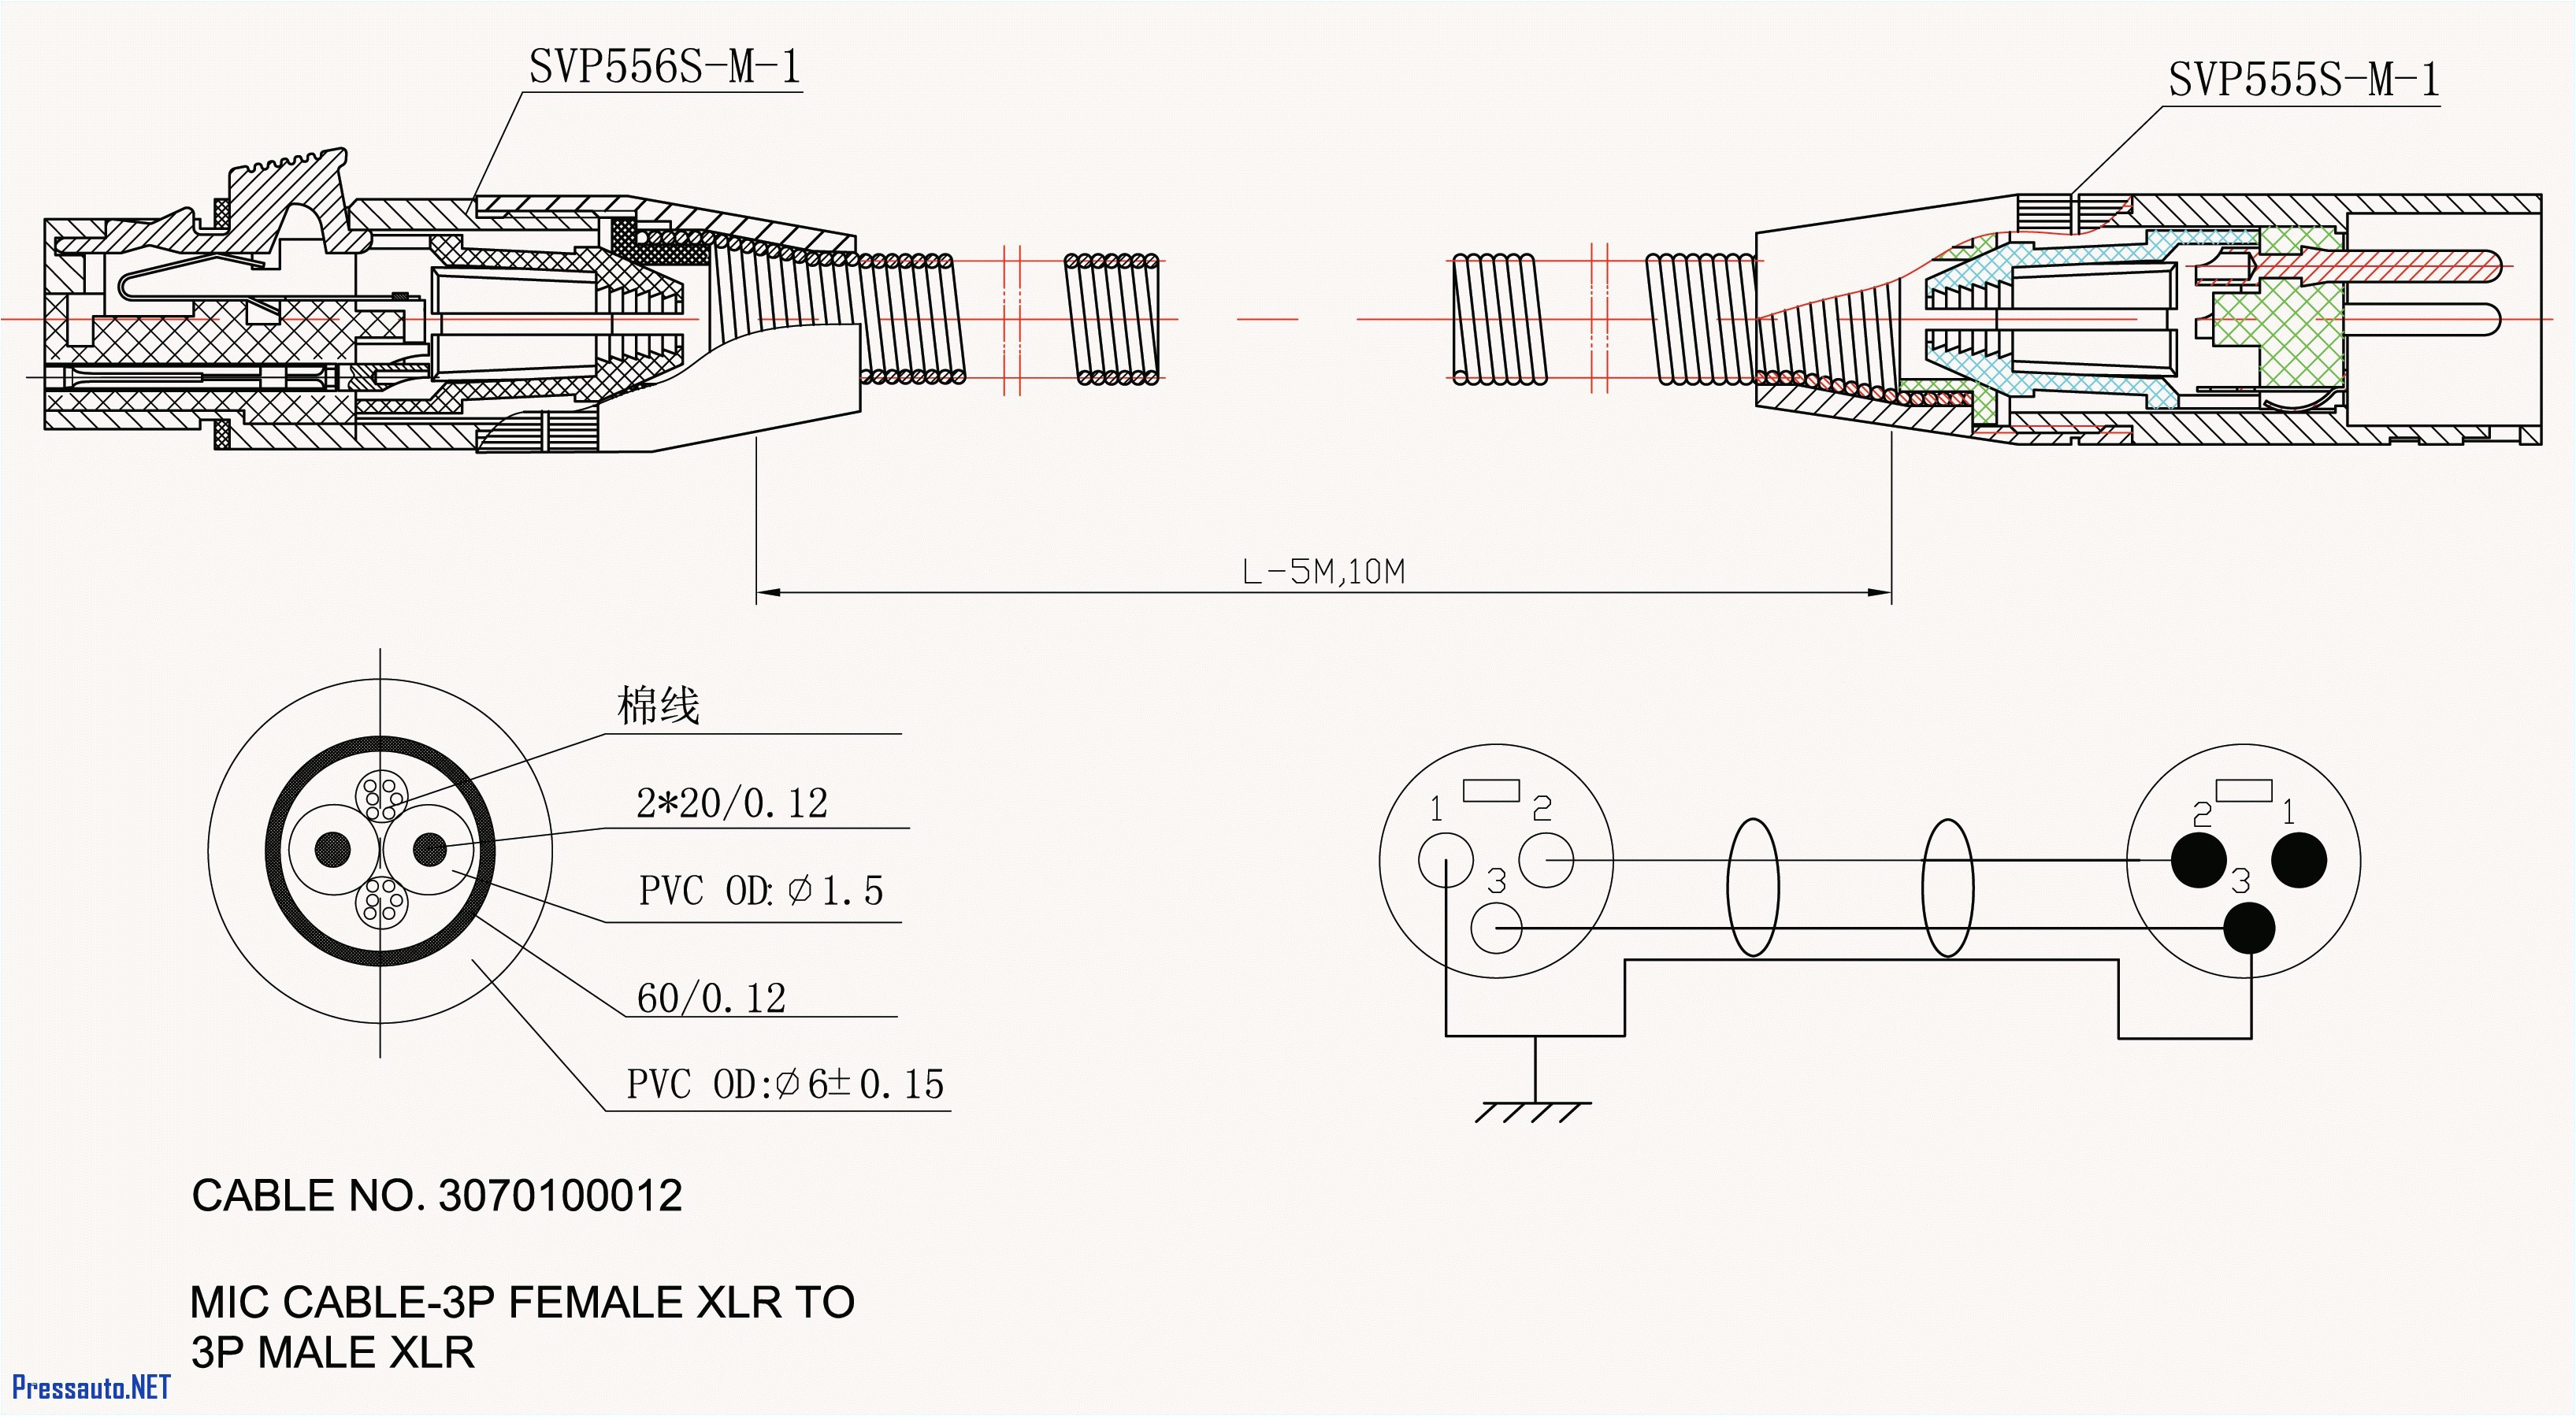 dji phantom parts diagram of ford ranger wiring harness diagramdownload by size handphone tablet desktop